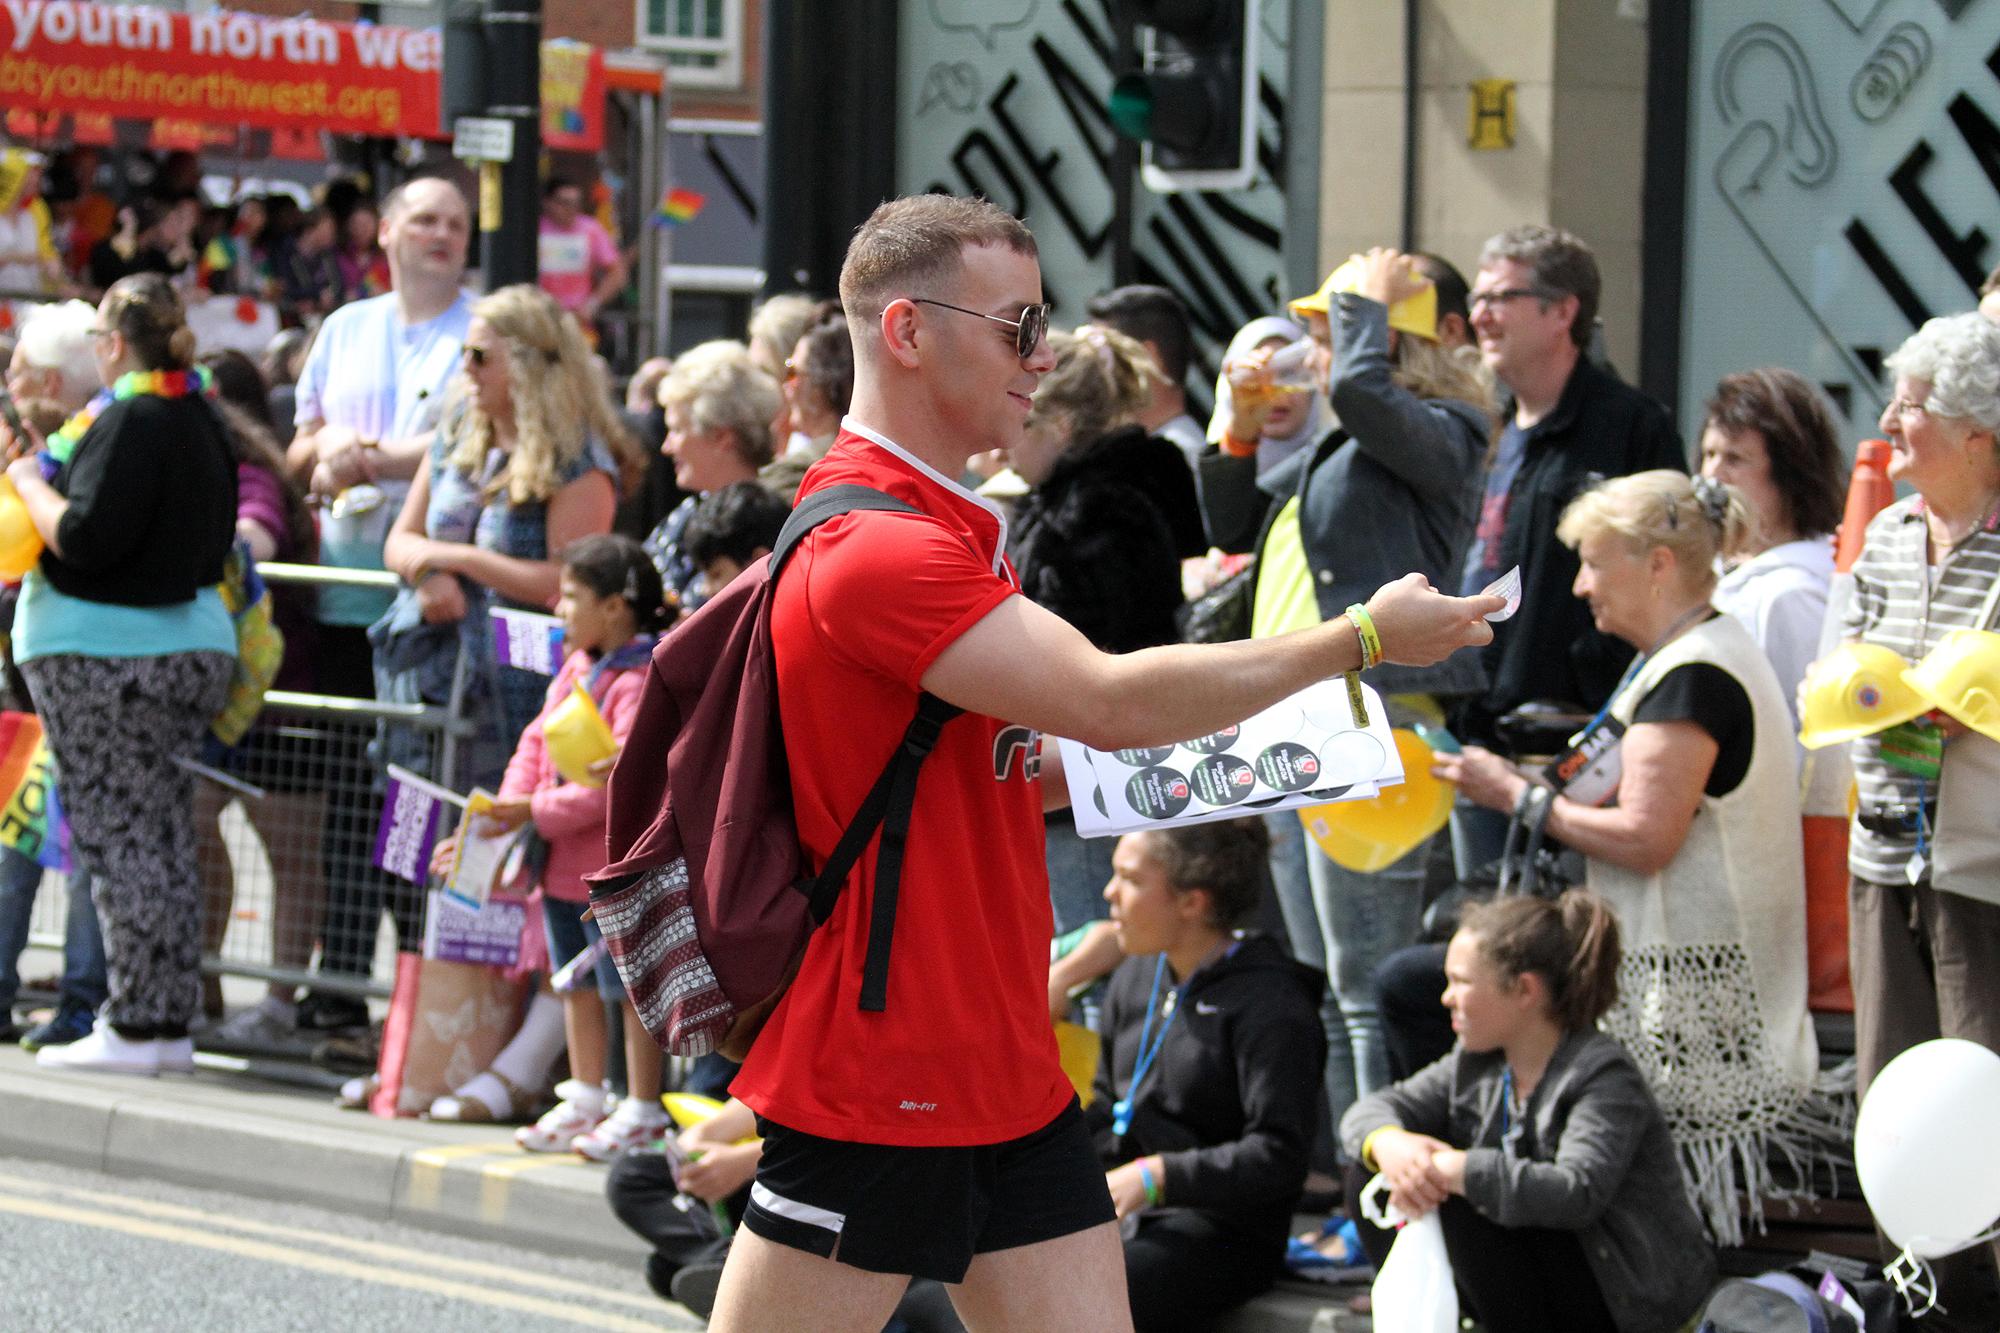 VMFC at Manchester Pride parade 2015  (2).jpg